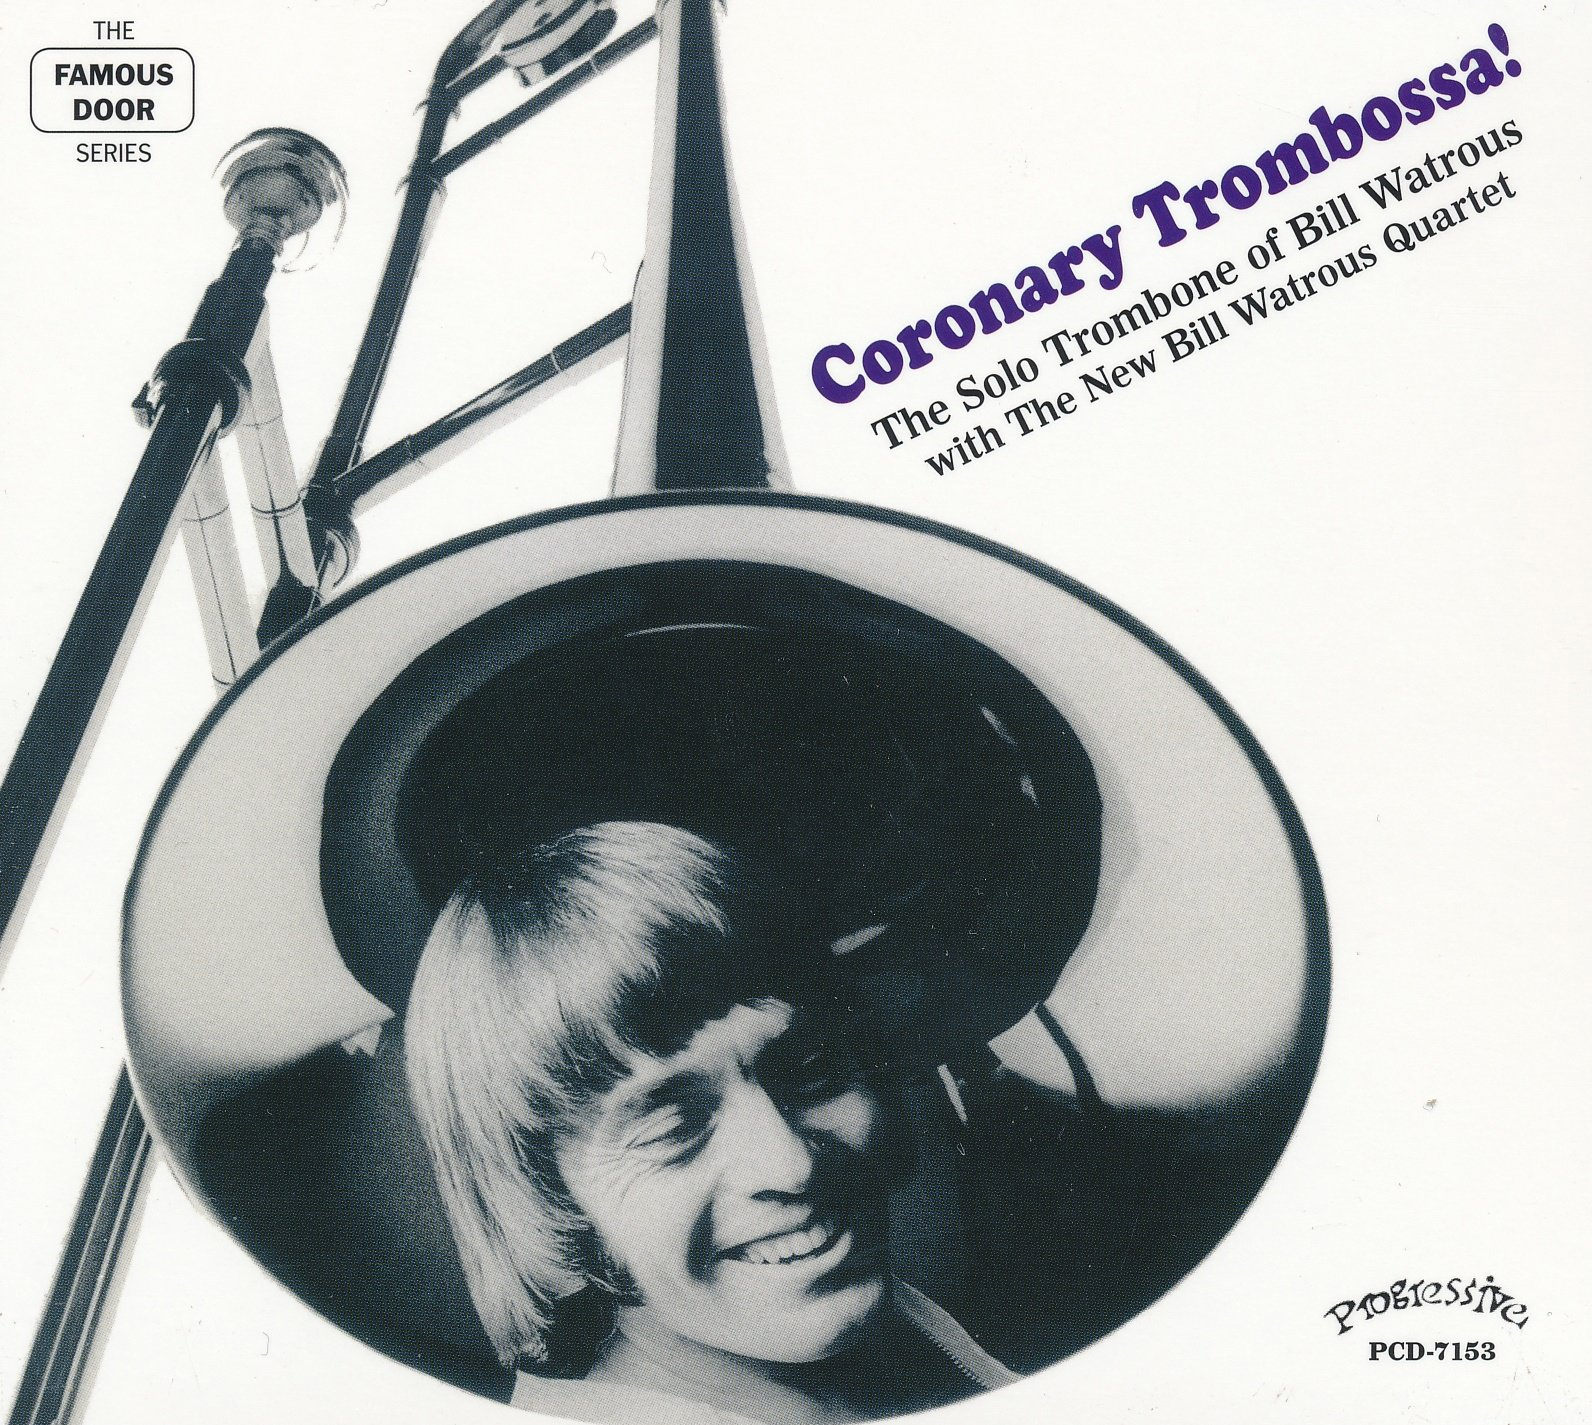 Bill Watrous - Coronary Trombossa